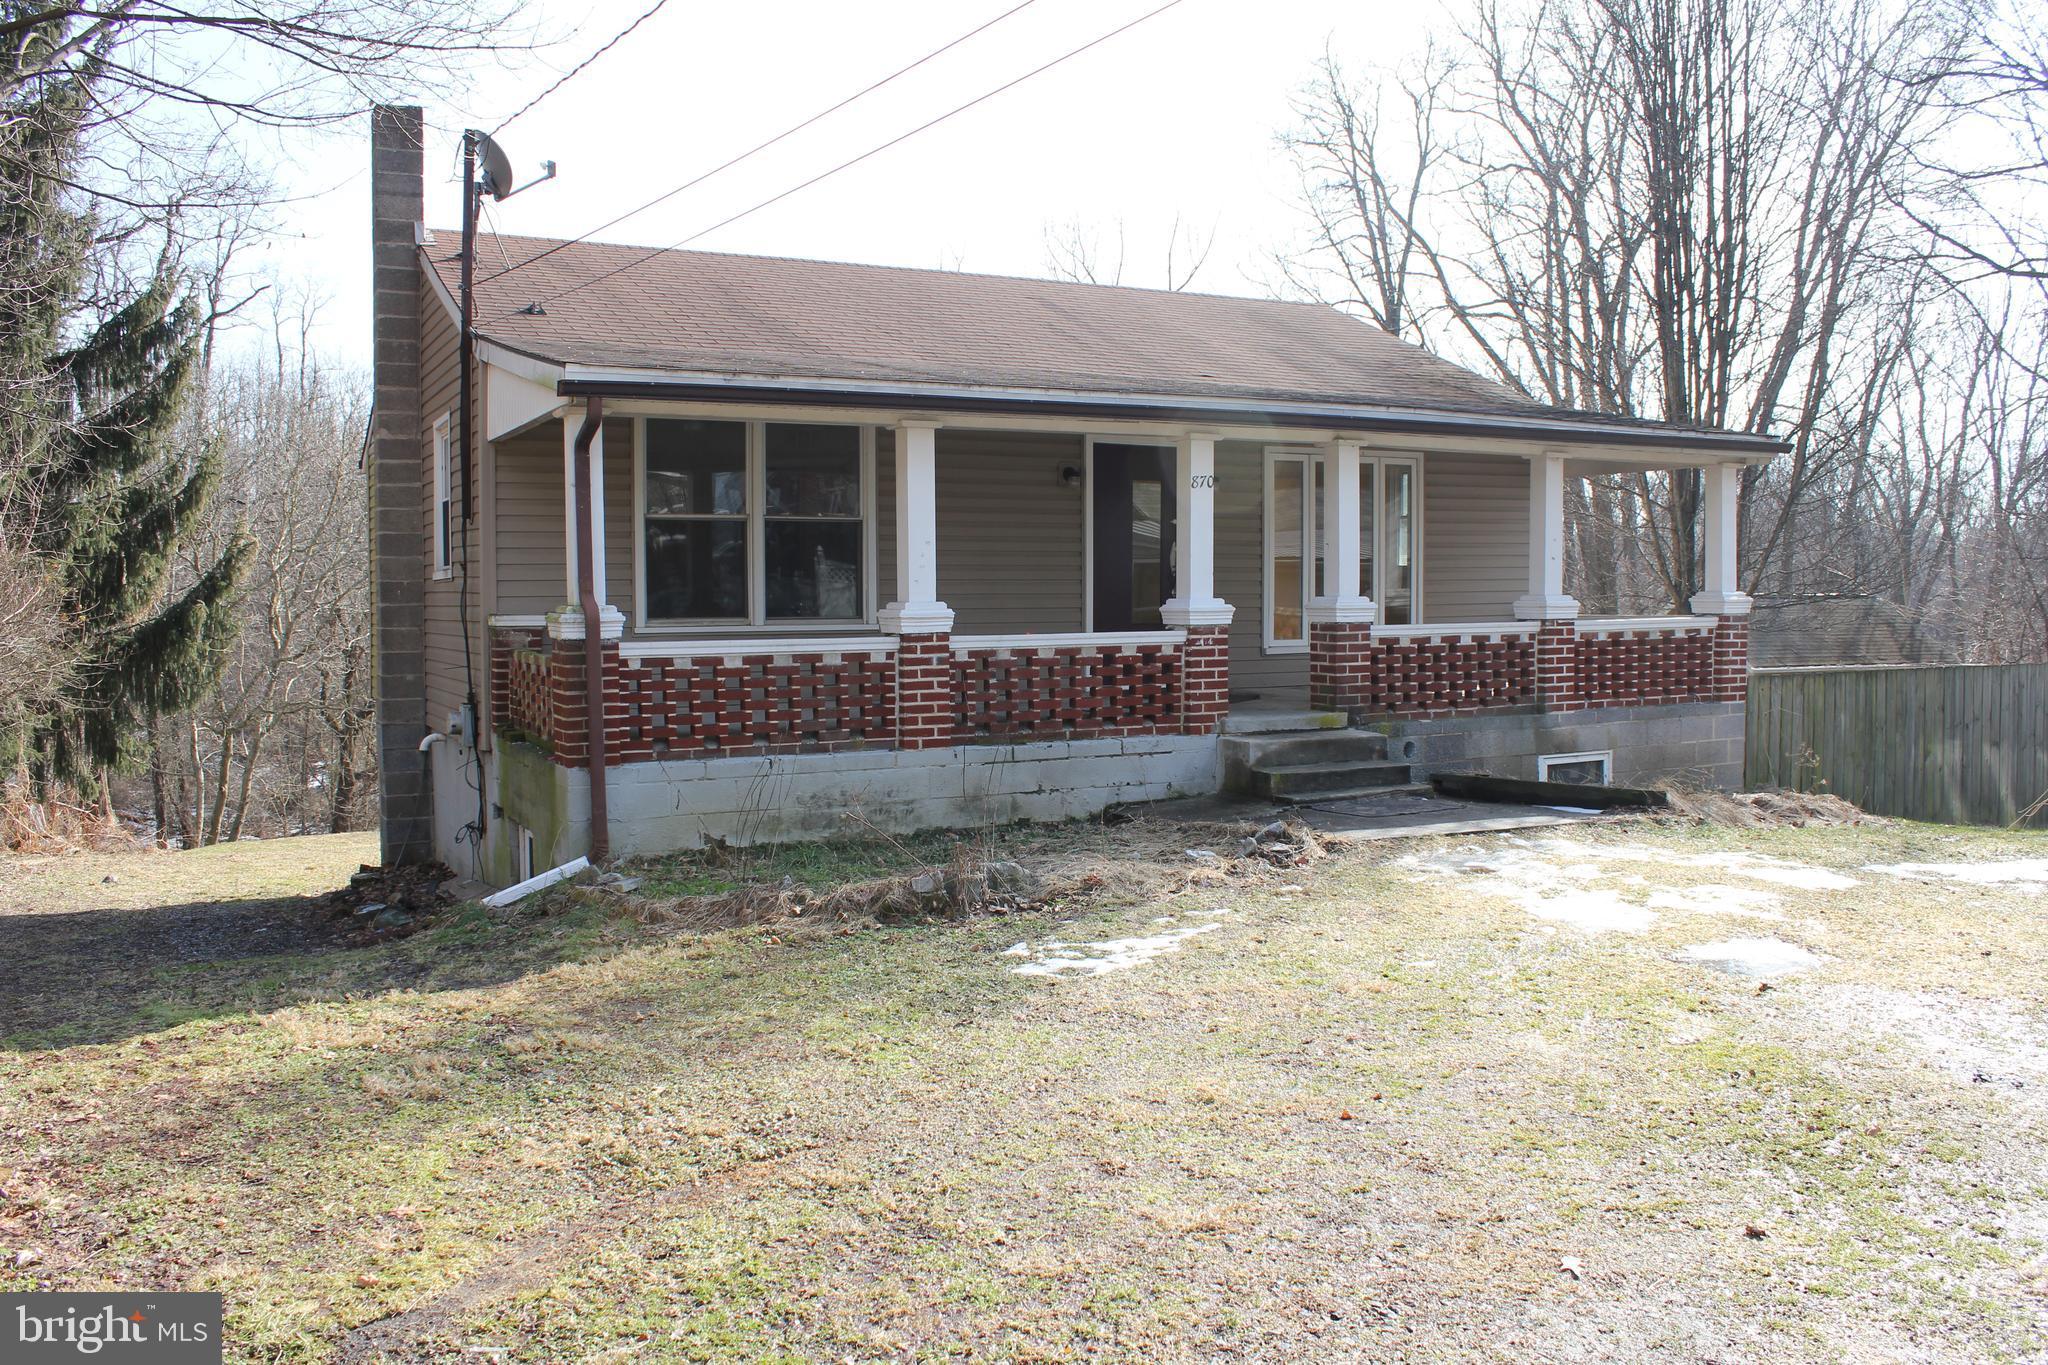 870 HIGHLAND STREET, HARRISBURG, PA 17113